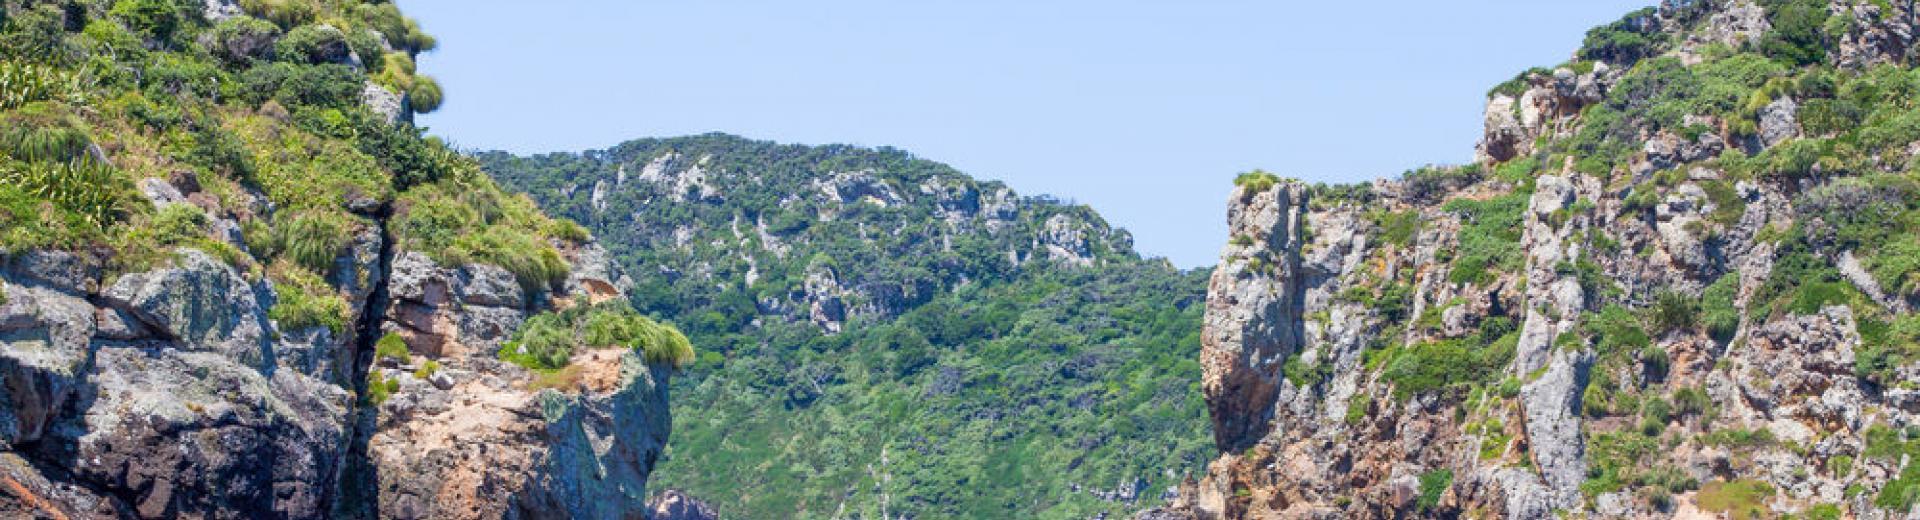 divingnz islands